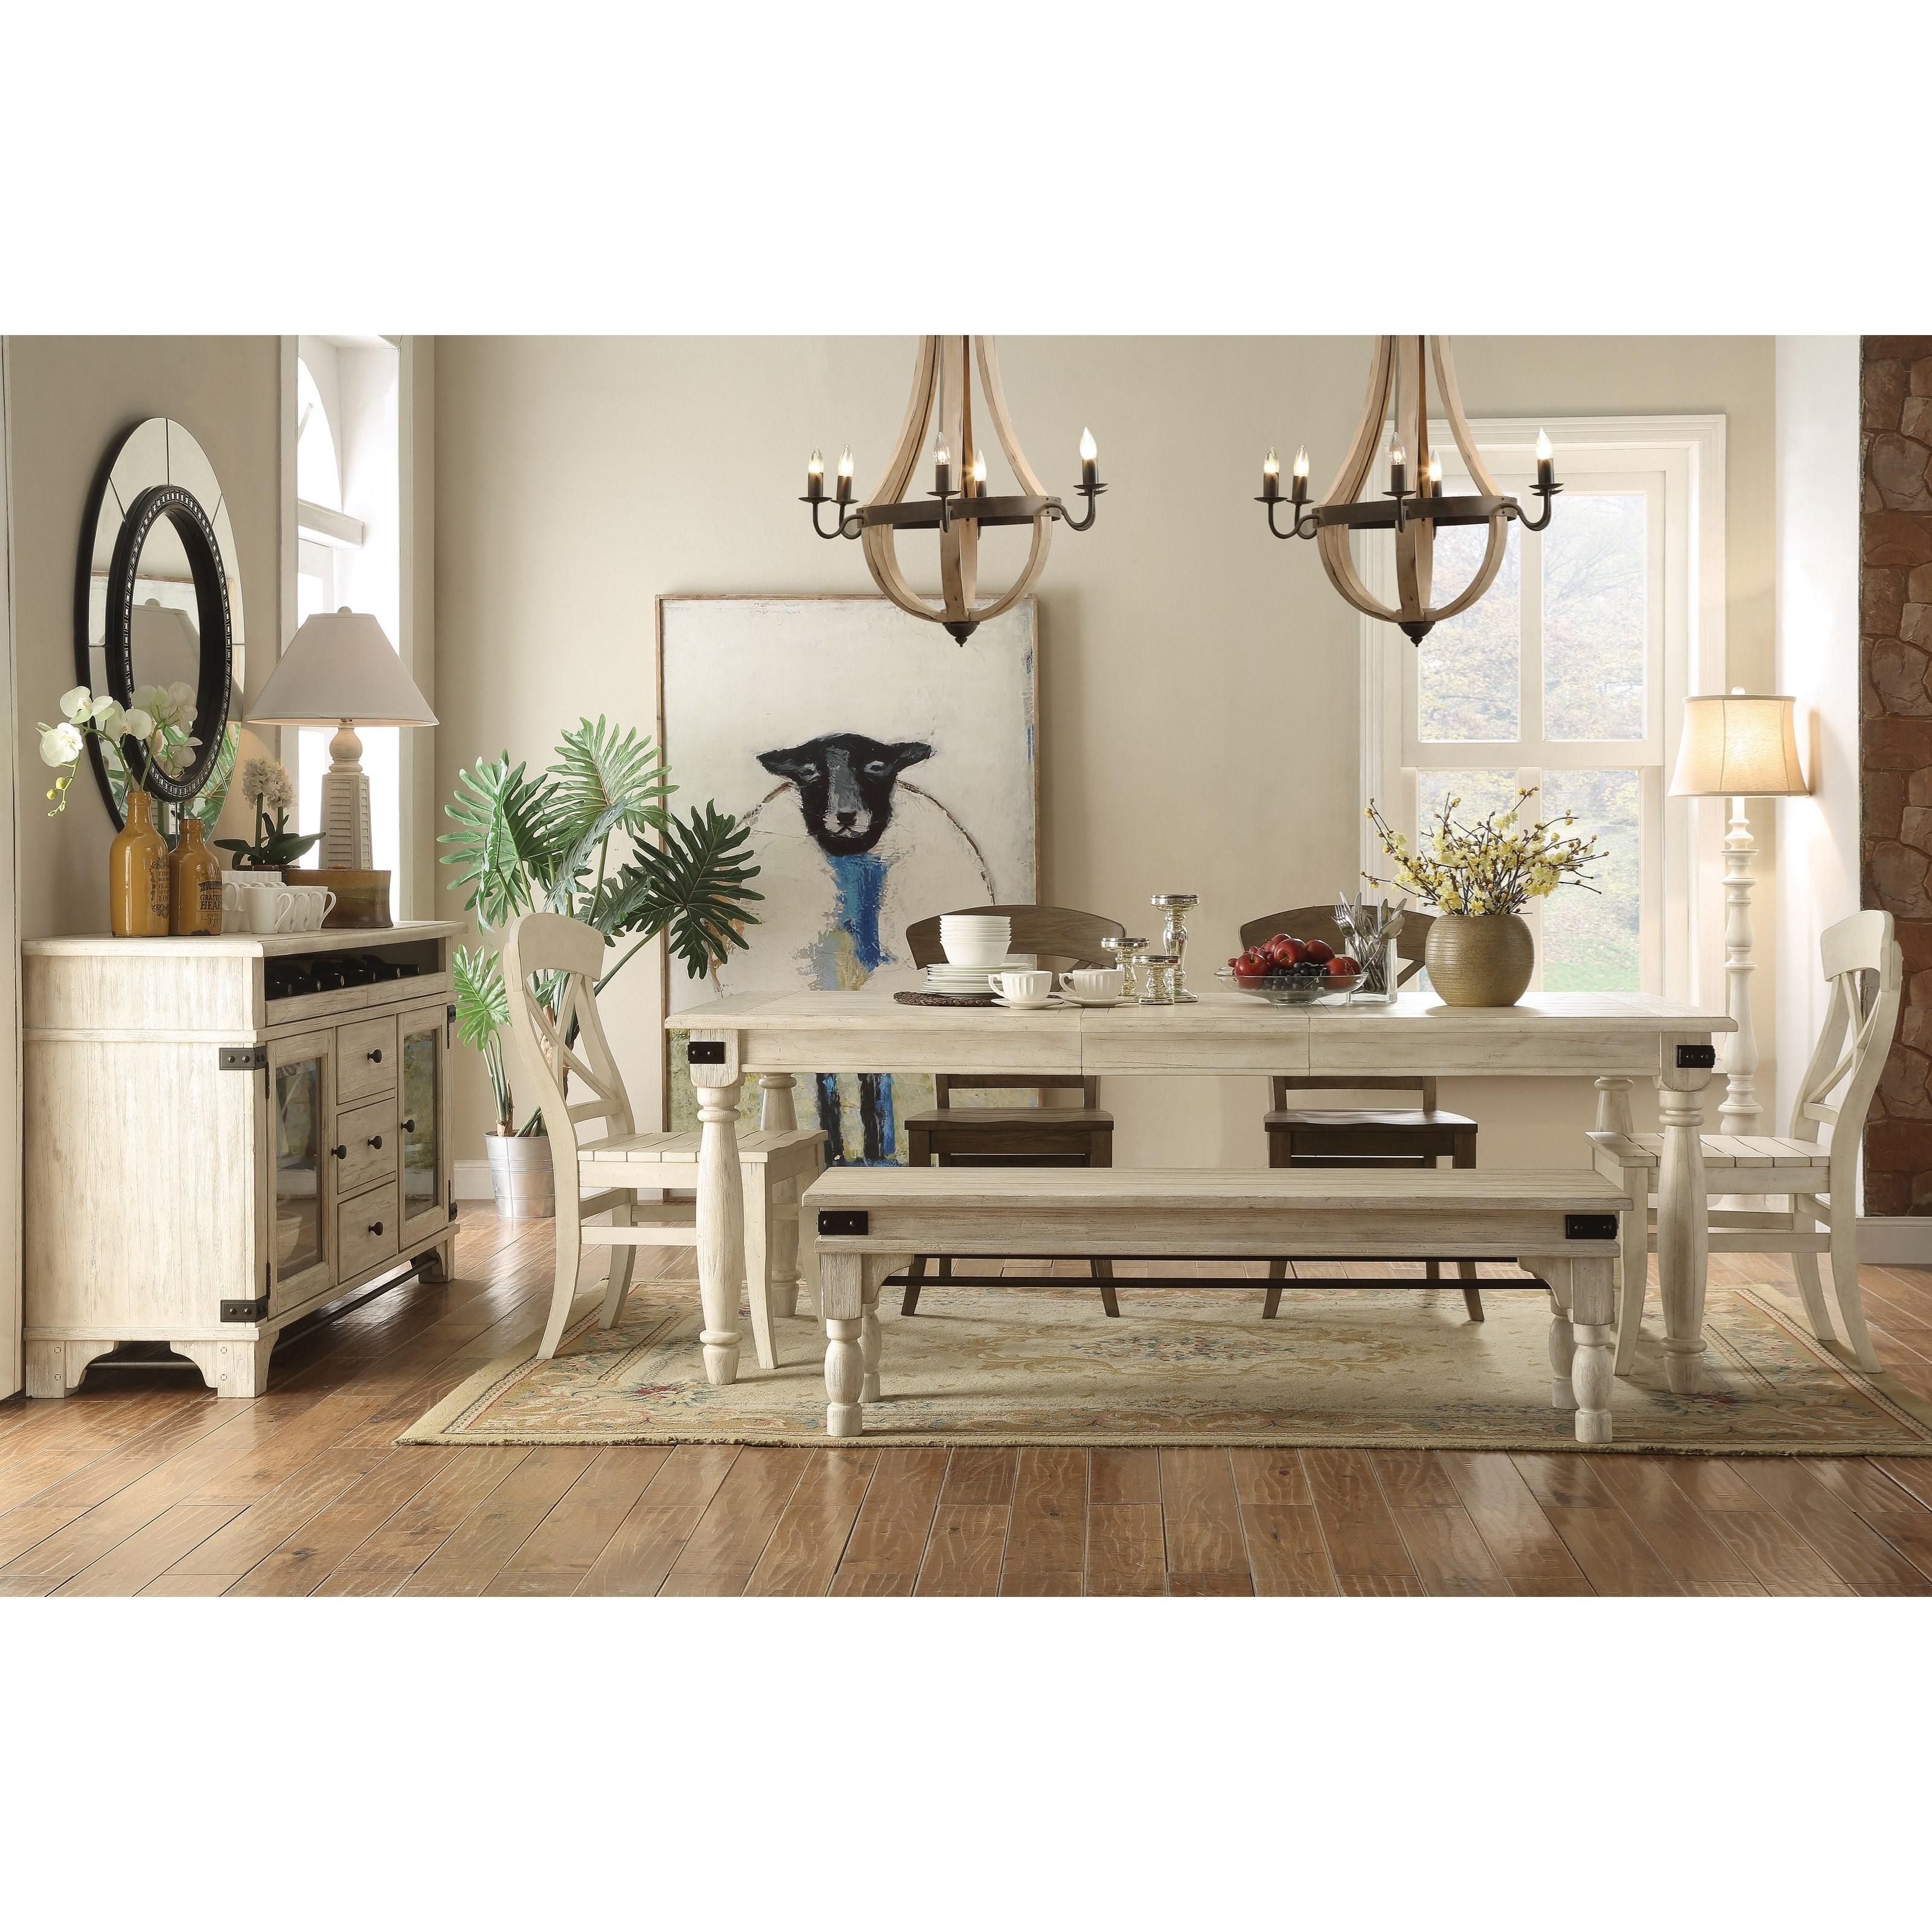 Regan Dining Room Group by Riverside Furniture at Furniture Barn